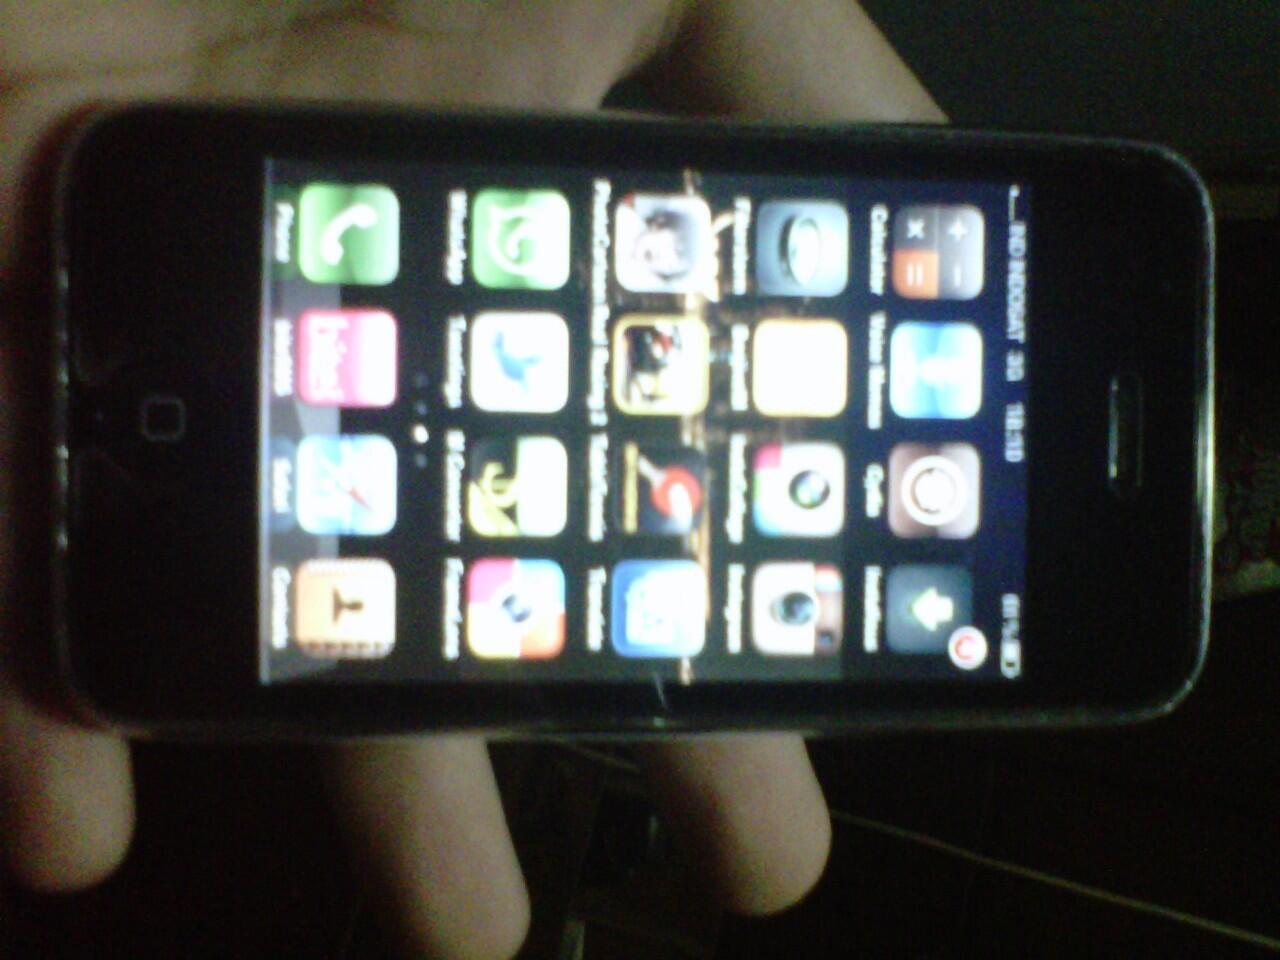 Iphone 3G | 16gb | OS 4.2.1 | Yogyakarta